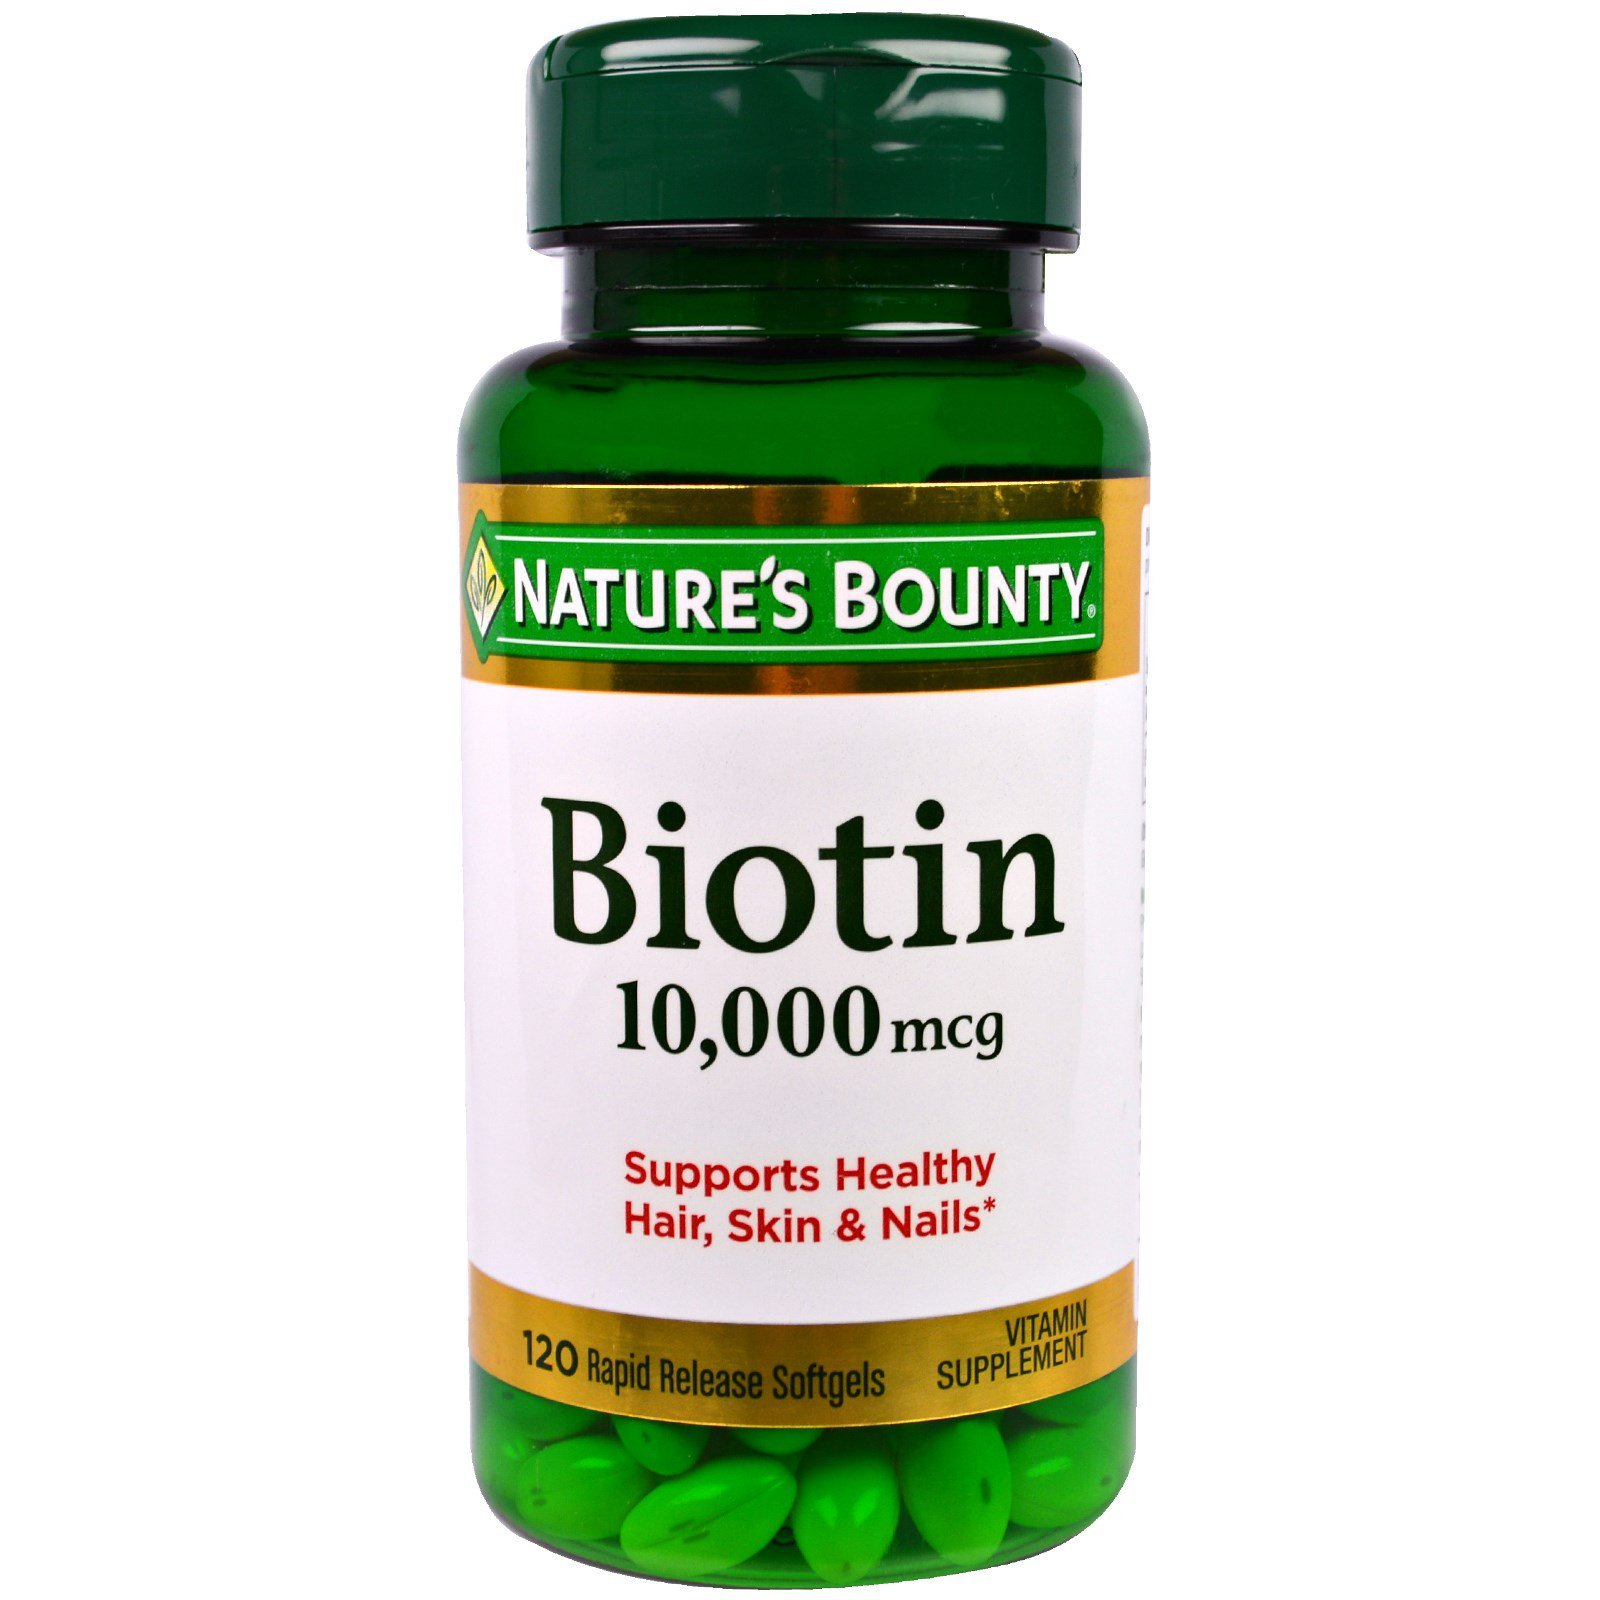 Nature's Bounty Biotin 10,000 mcg, Rapid Release Softgels 120 ea (Pack of 3)